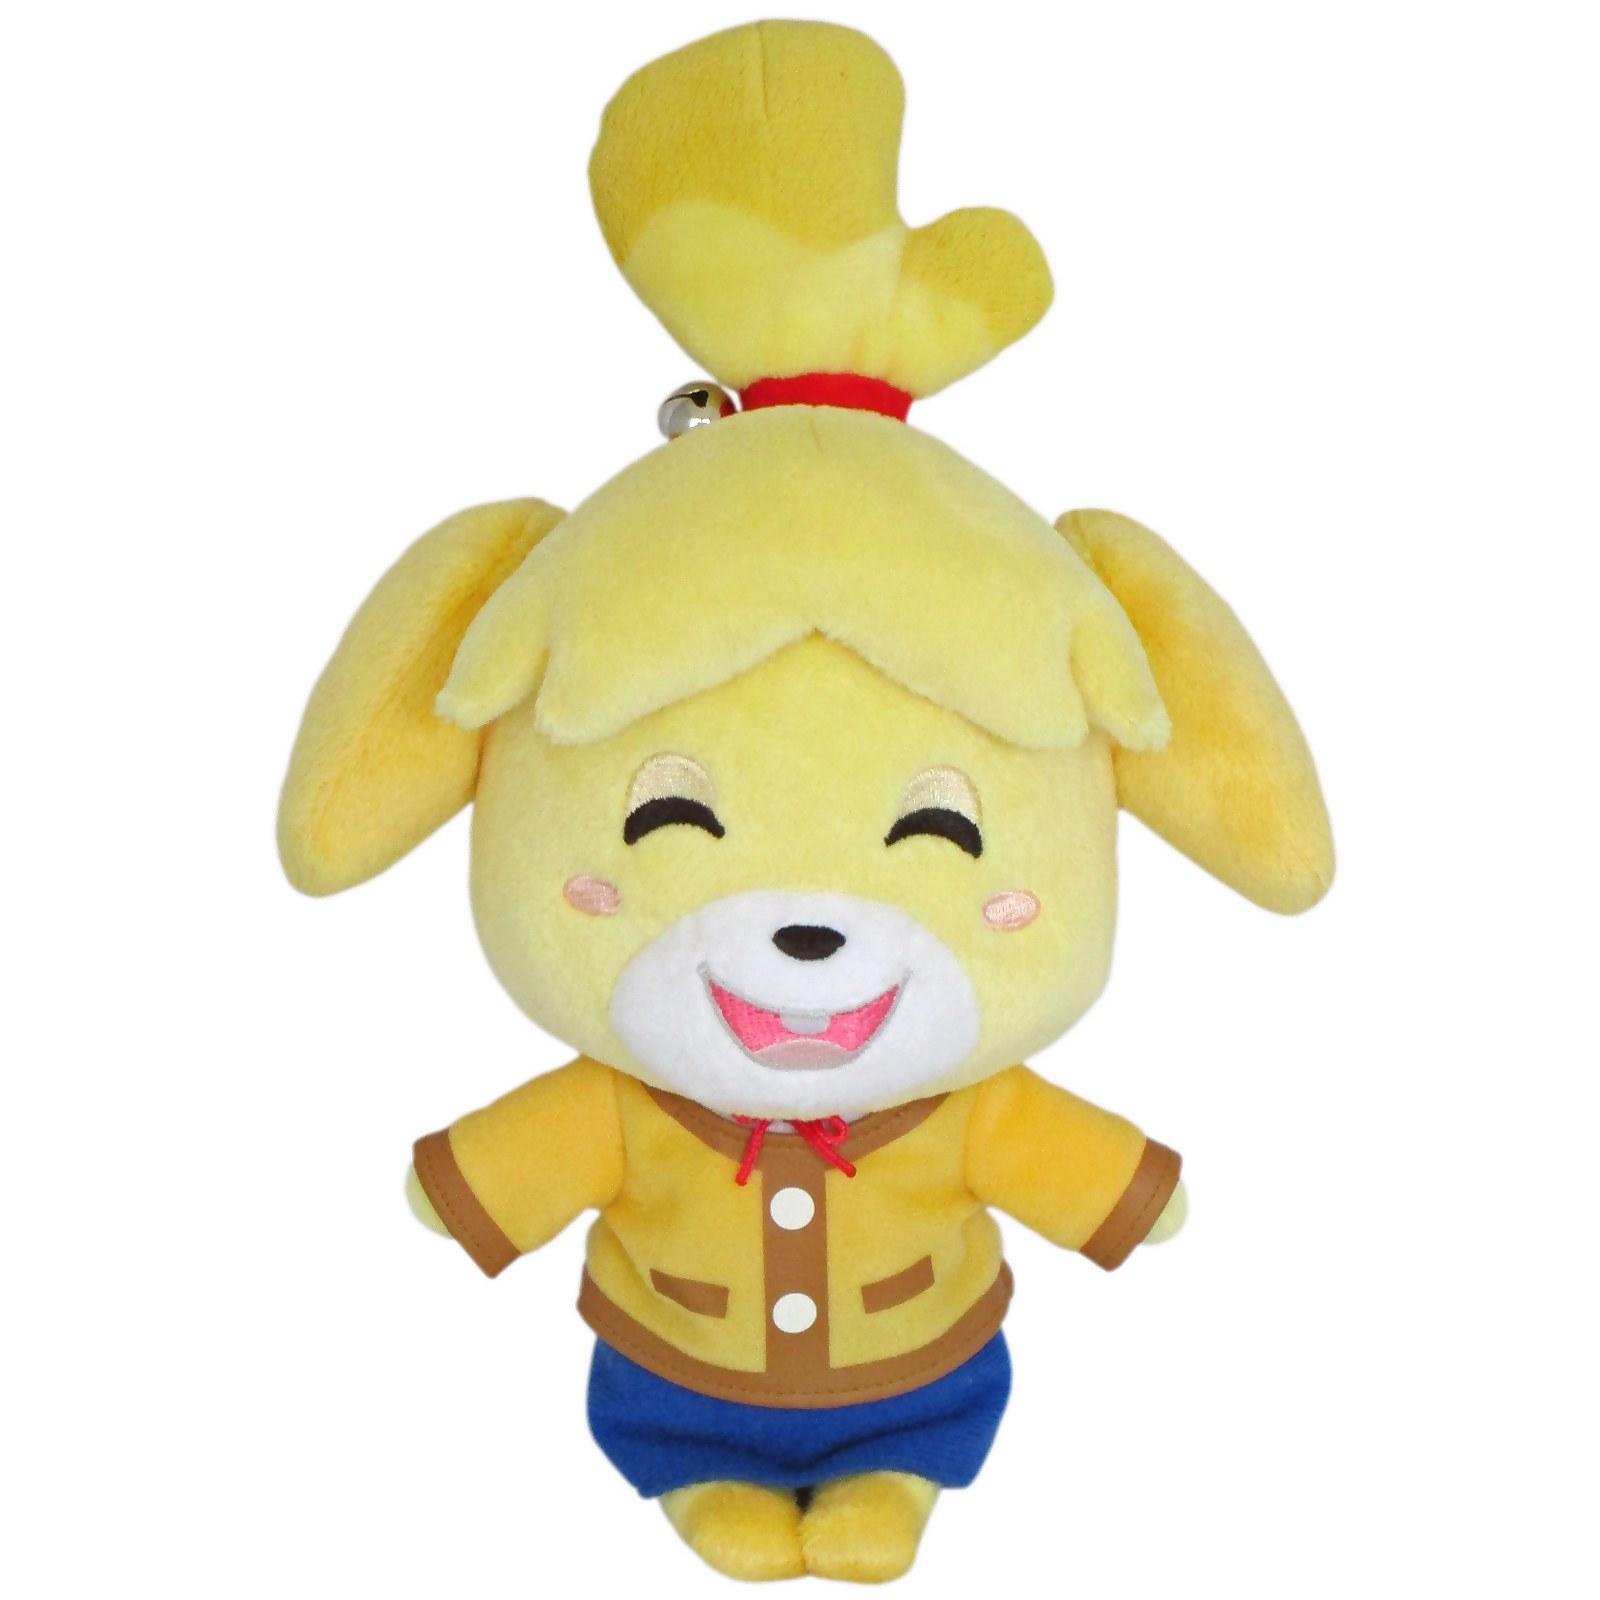 Image of Animal Crossing - Isabelle Plush 20cm